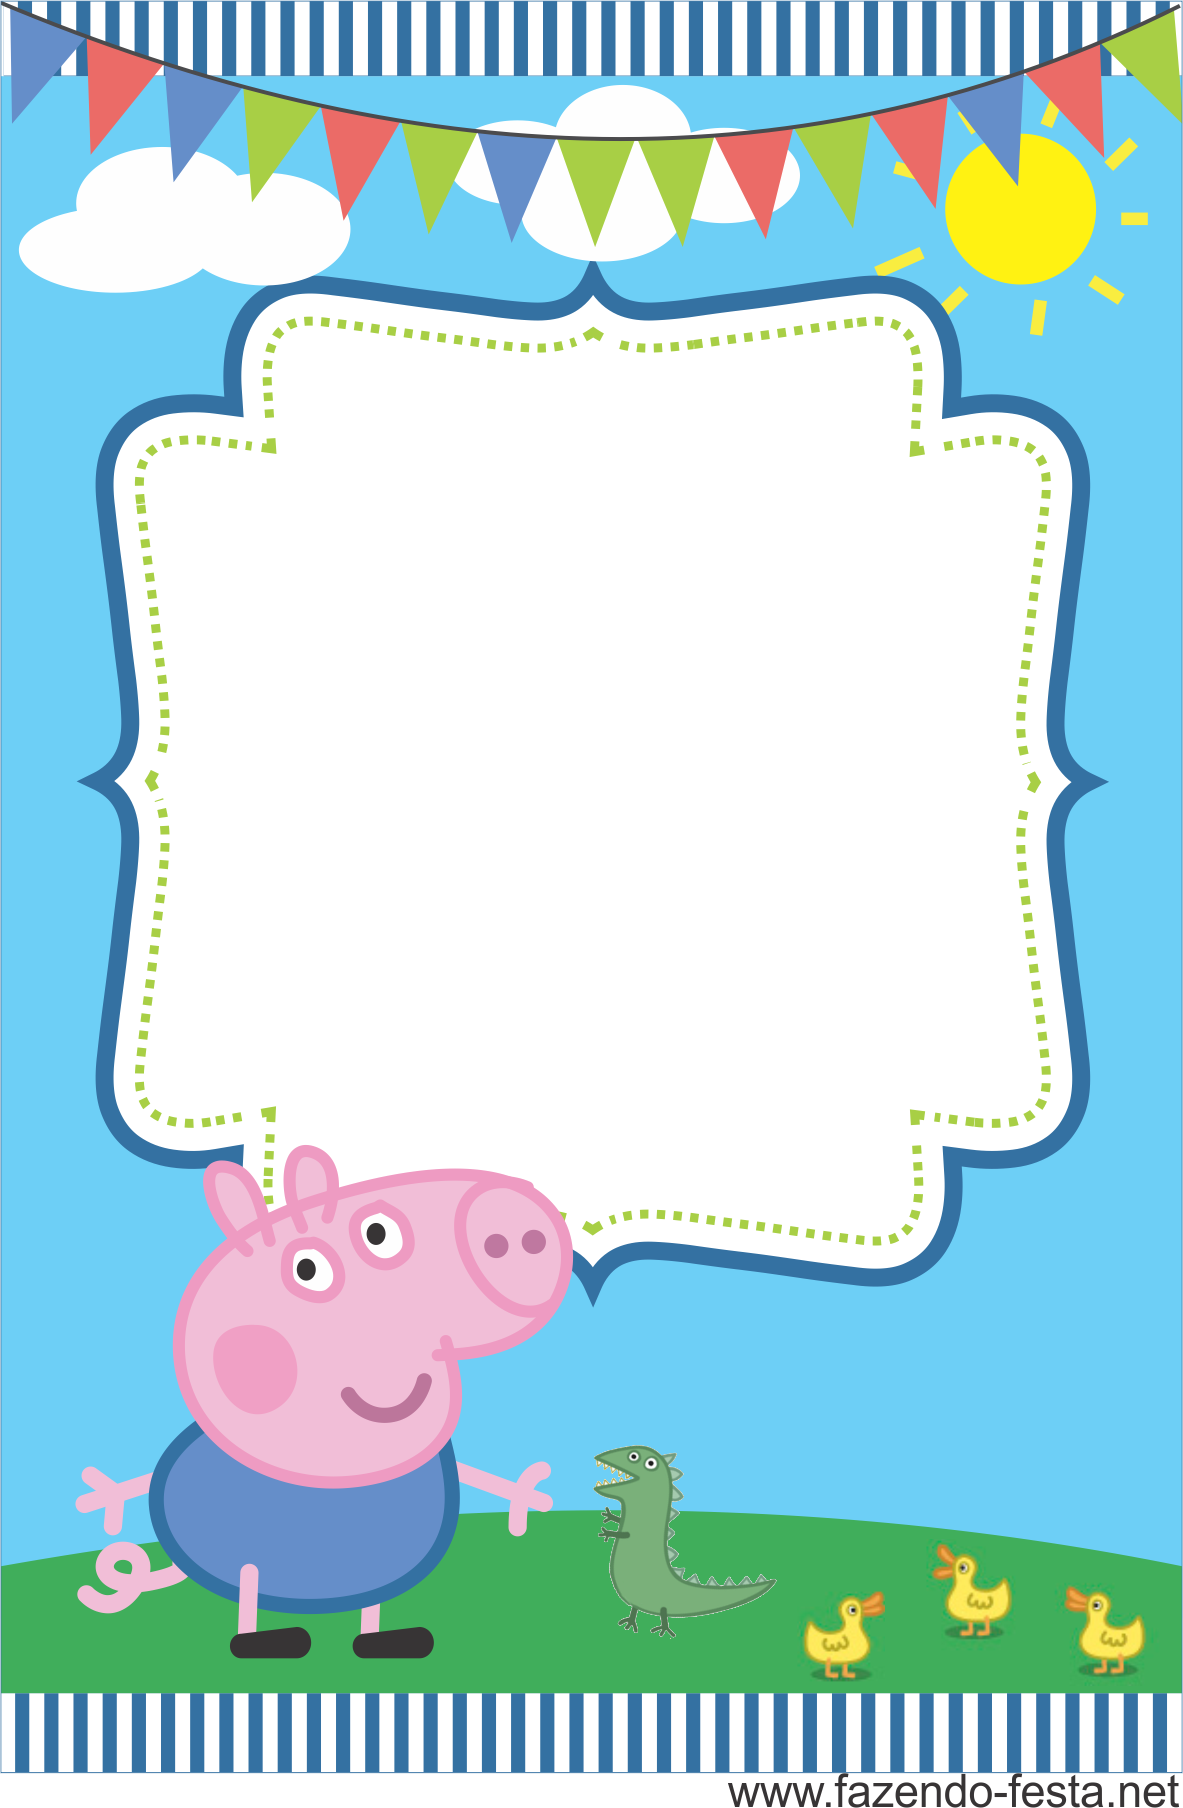 Imagens De Convite Aniversario Da Peppa Arte Pig Para Imprimir Grife  Convites Elo7